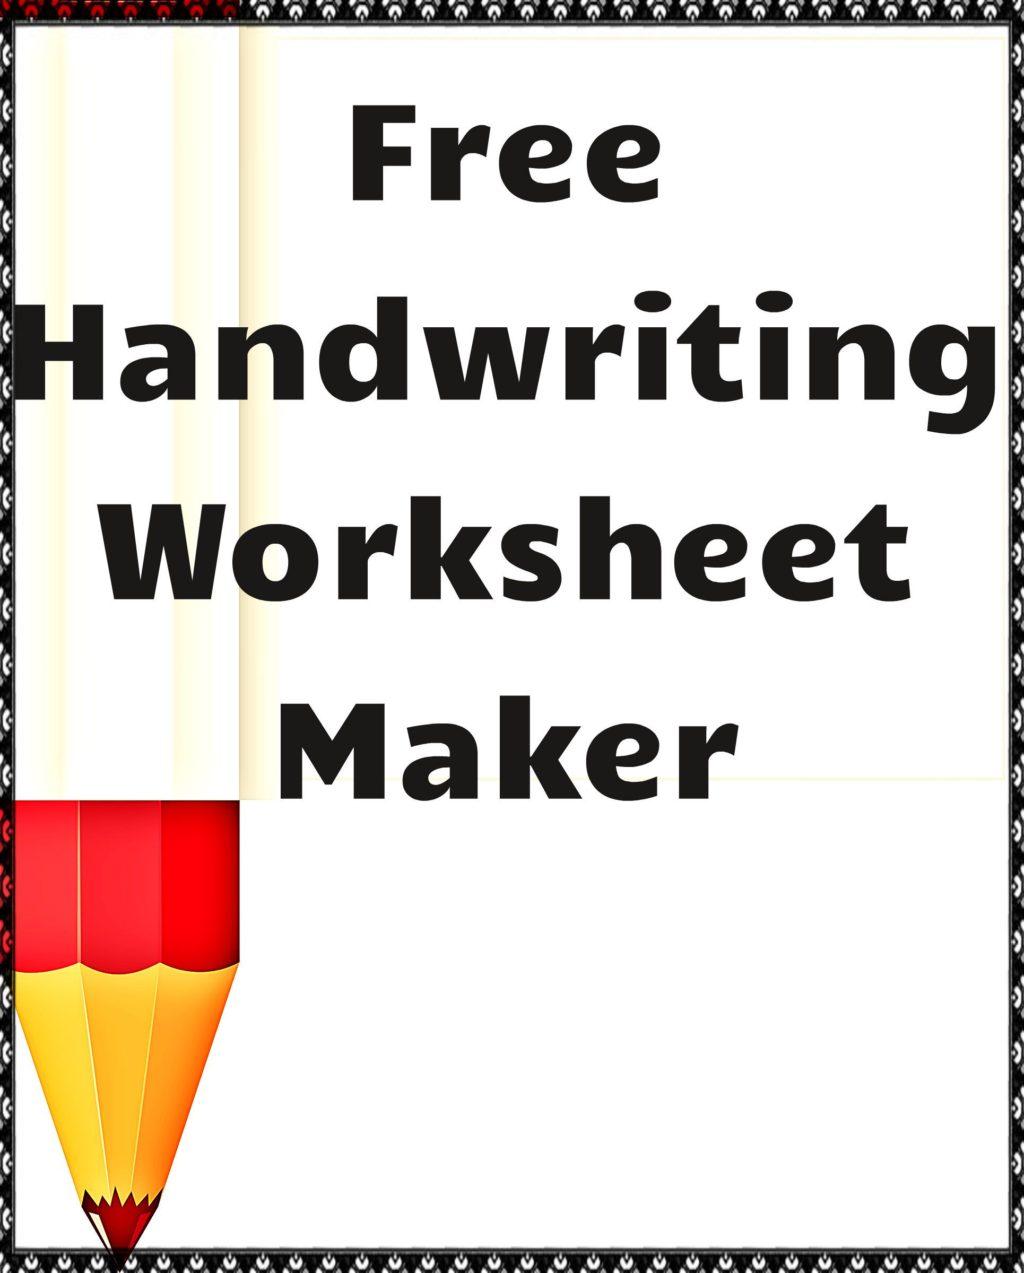 Worksheet ~ Fabulousandwriting Worksheet Maker The Amazing